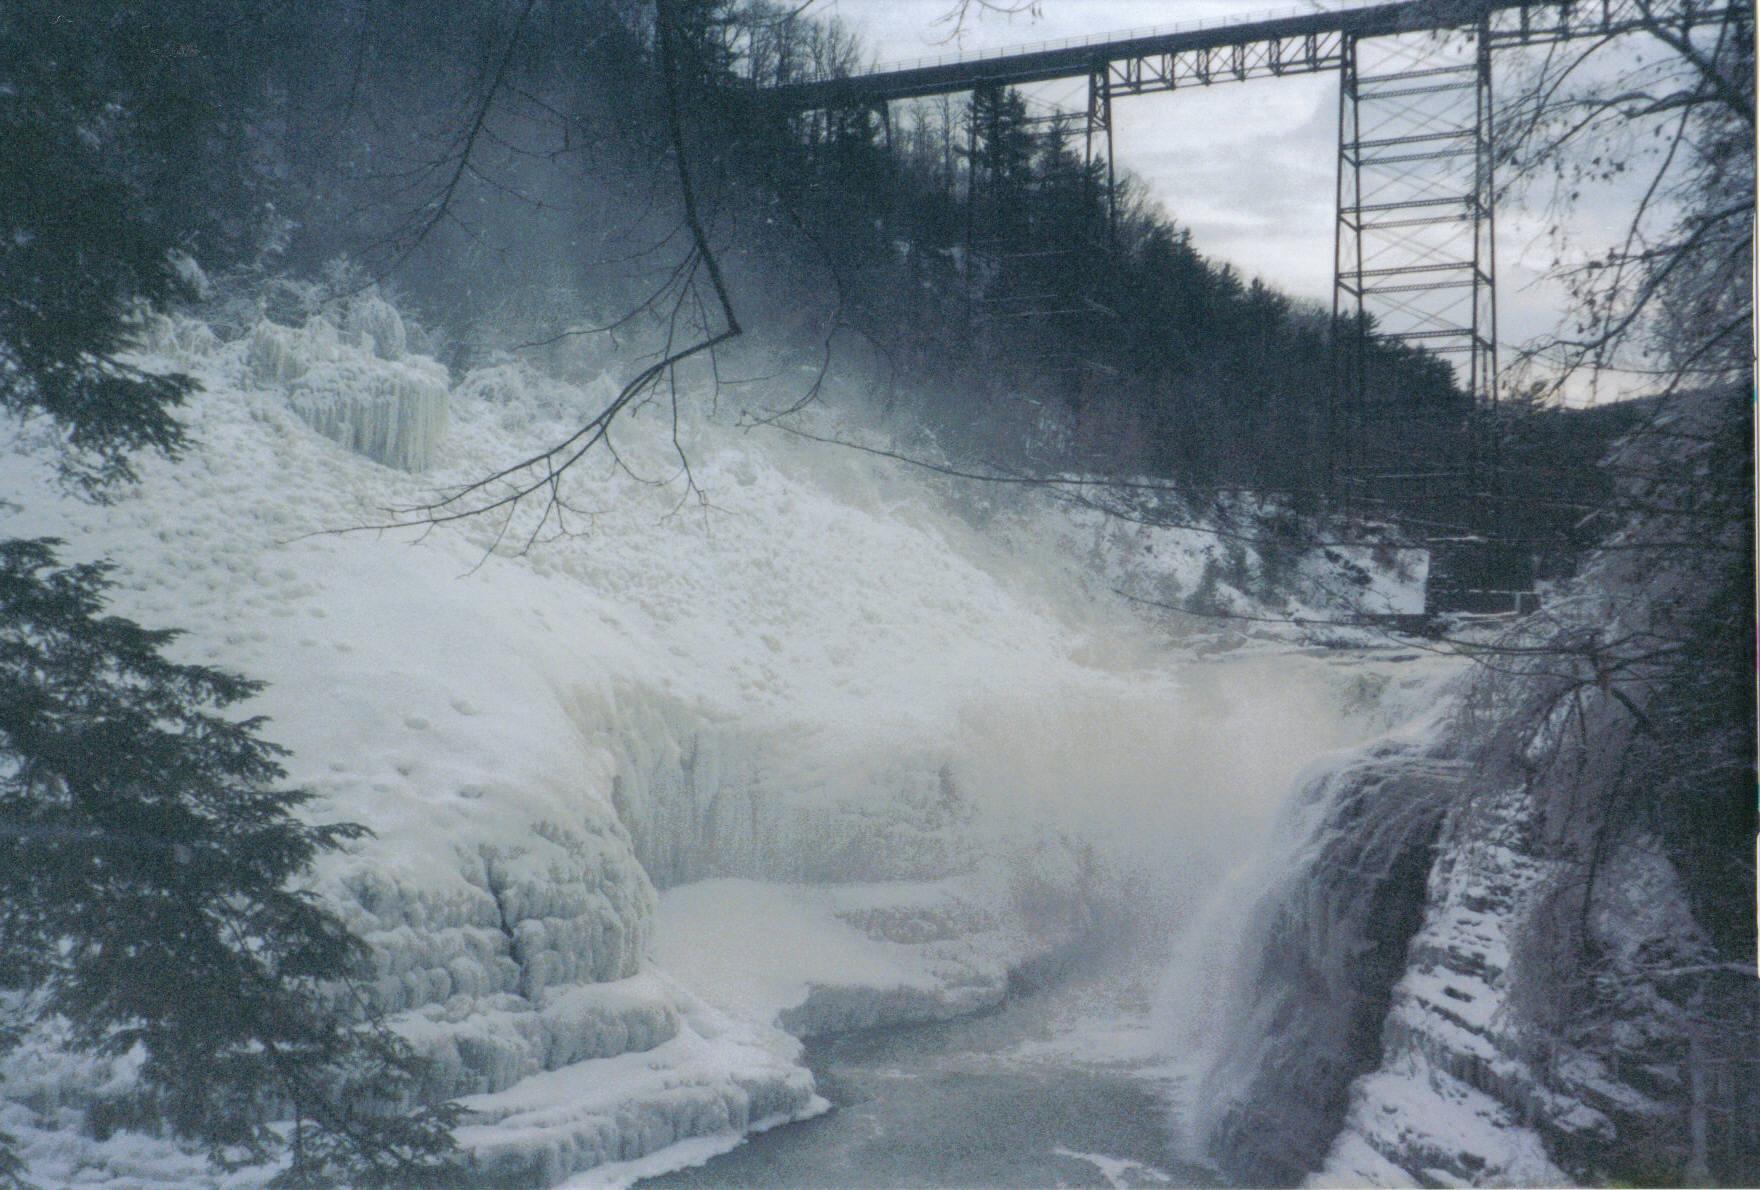 Letchworth's Upper Falls in Winter